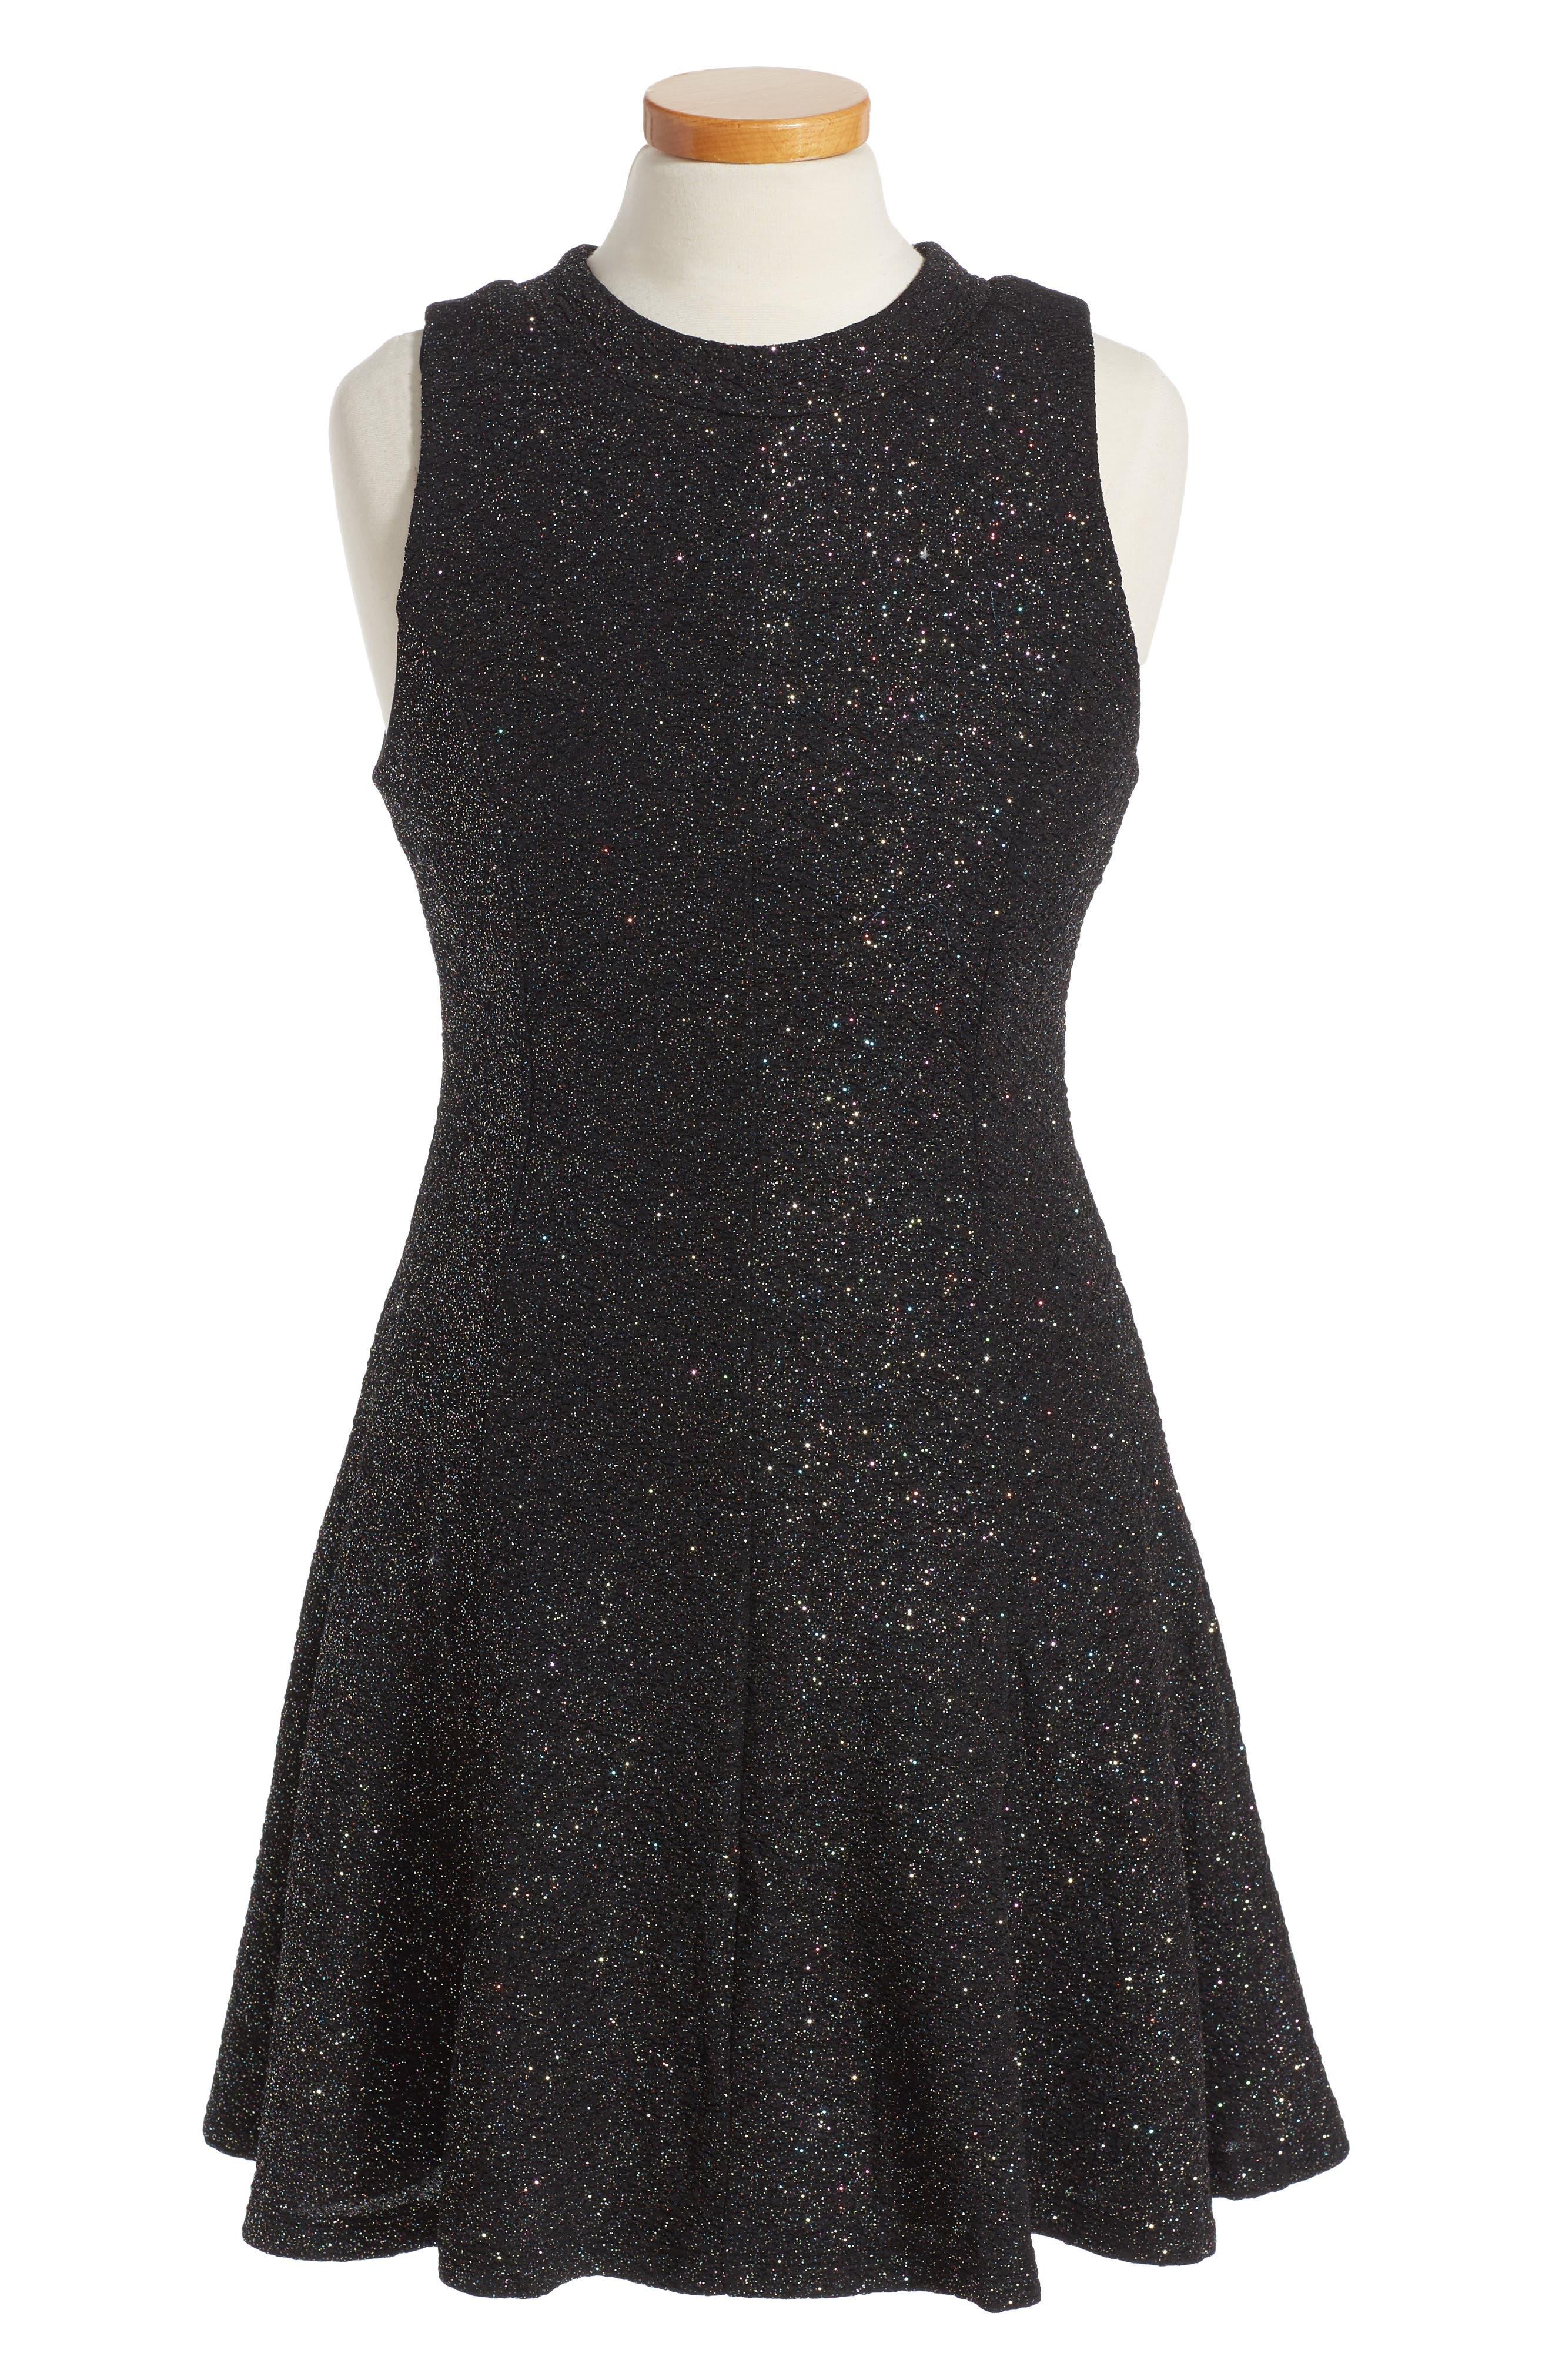 Shimmer Swing Dress,                         Main,                         color, 001